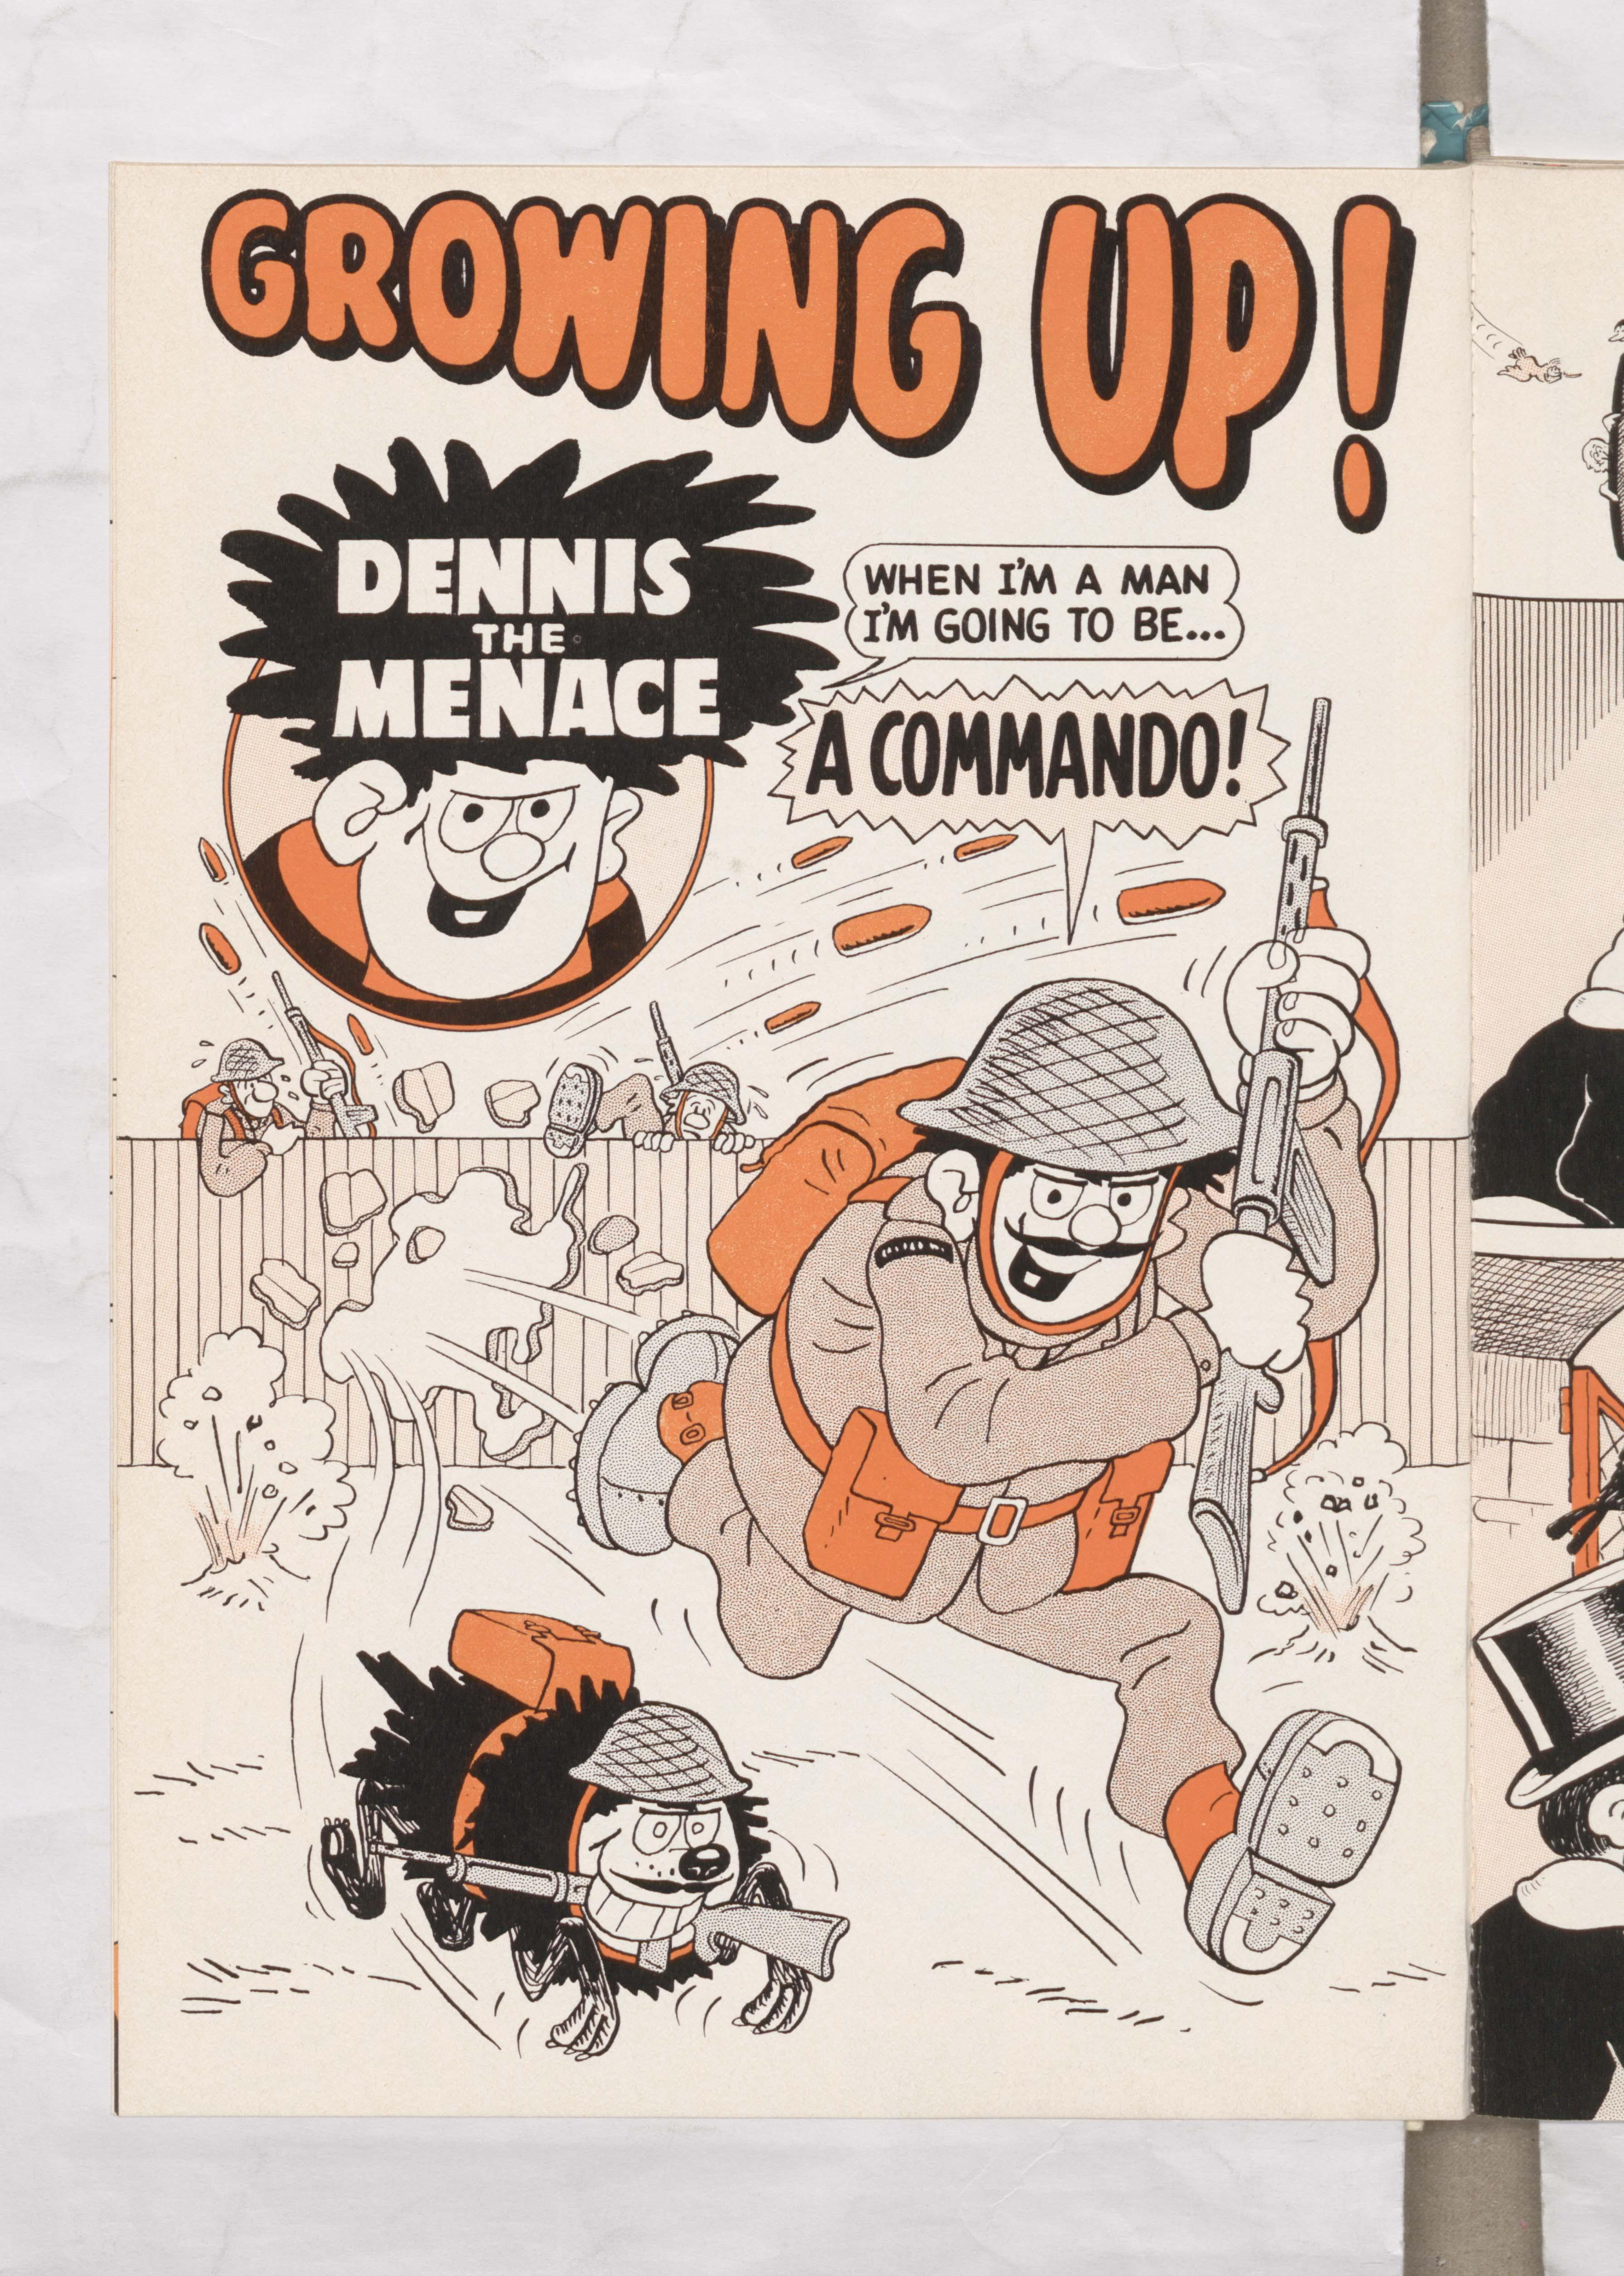 Beano Book 1976 Annual - Dennis grows up